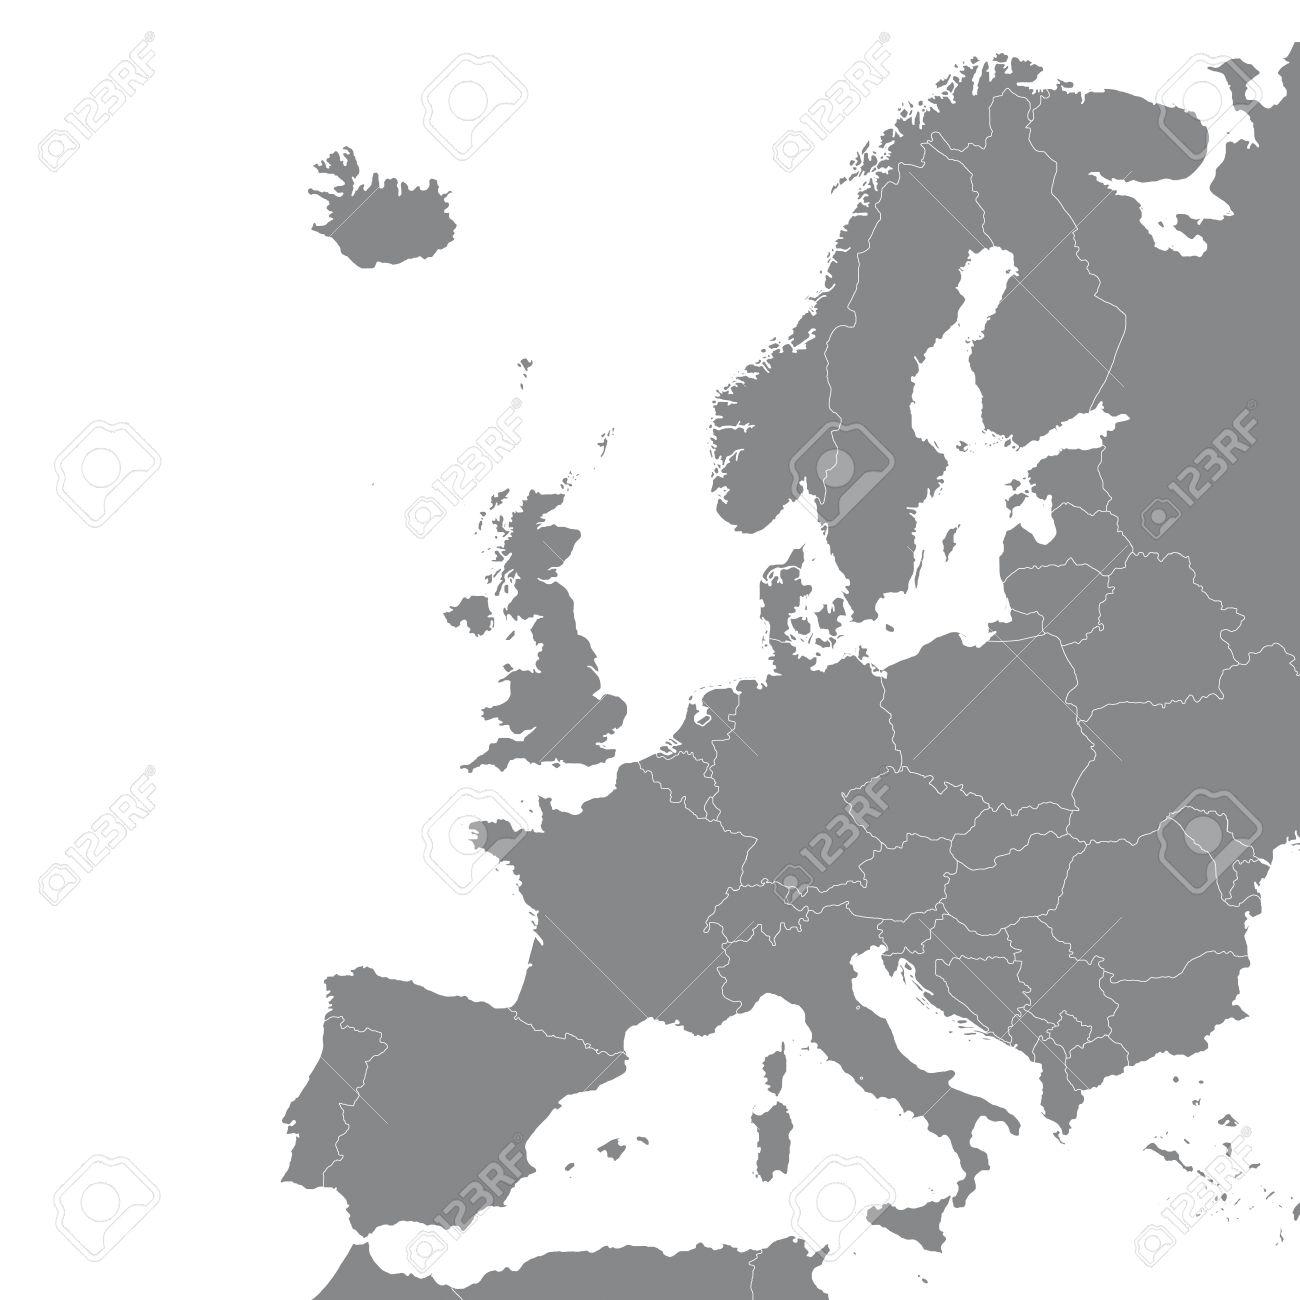 Carte Europe Grise.Europe Accord De Schengen Bruxelles Belgique Euro Geo Carte Carte Silhouette Plan De La Cartographie